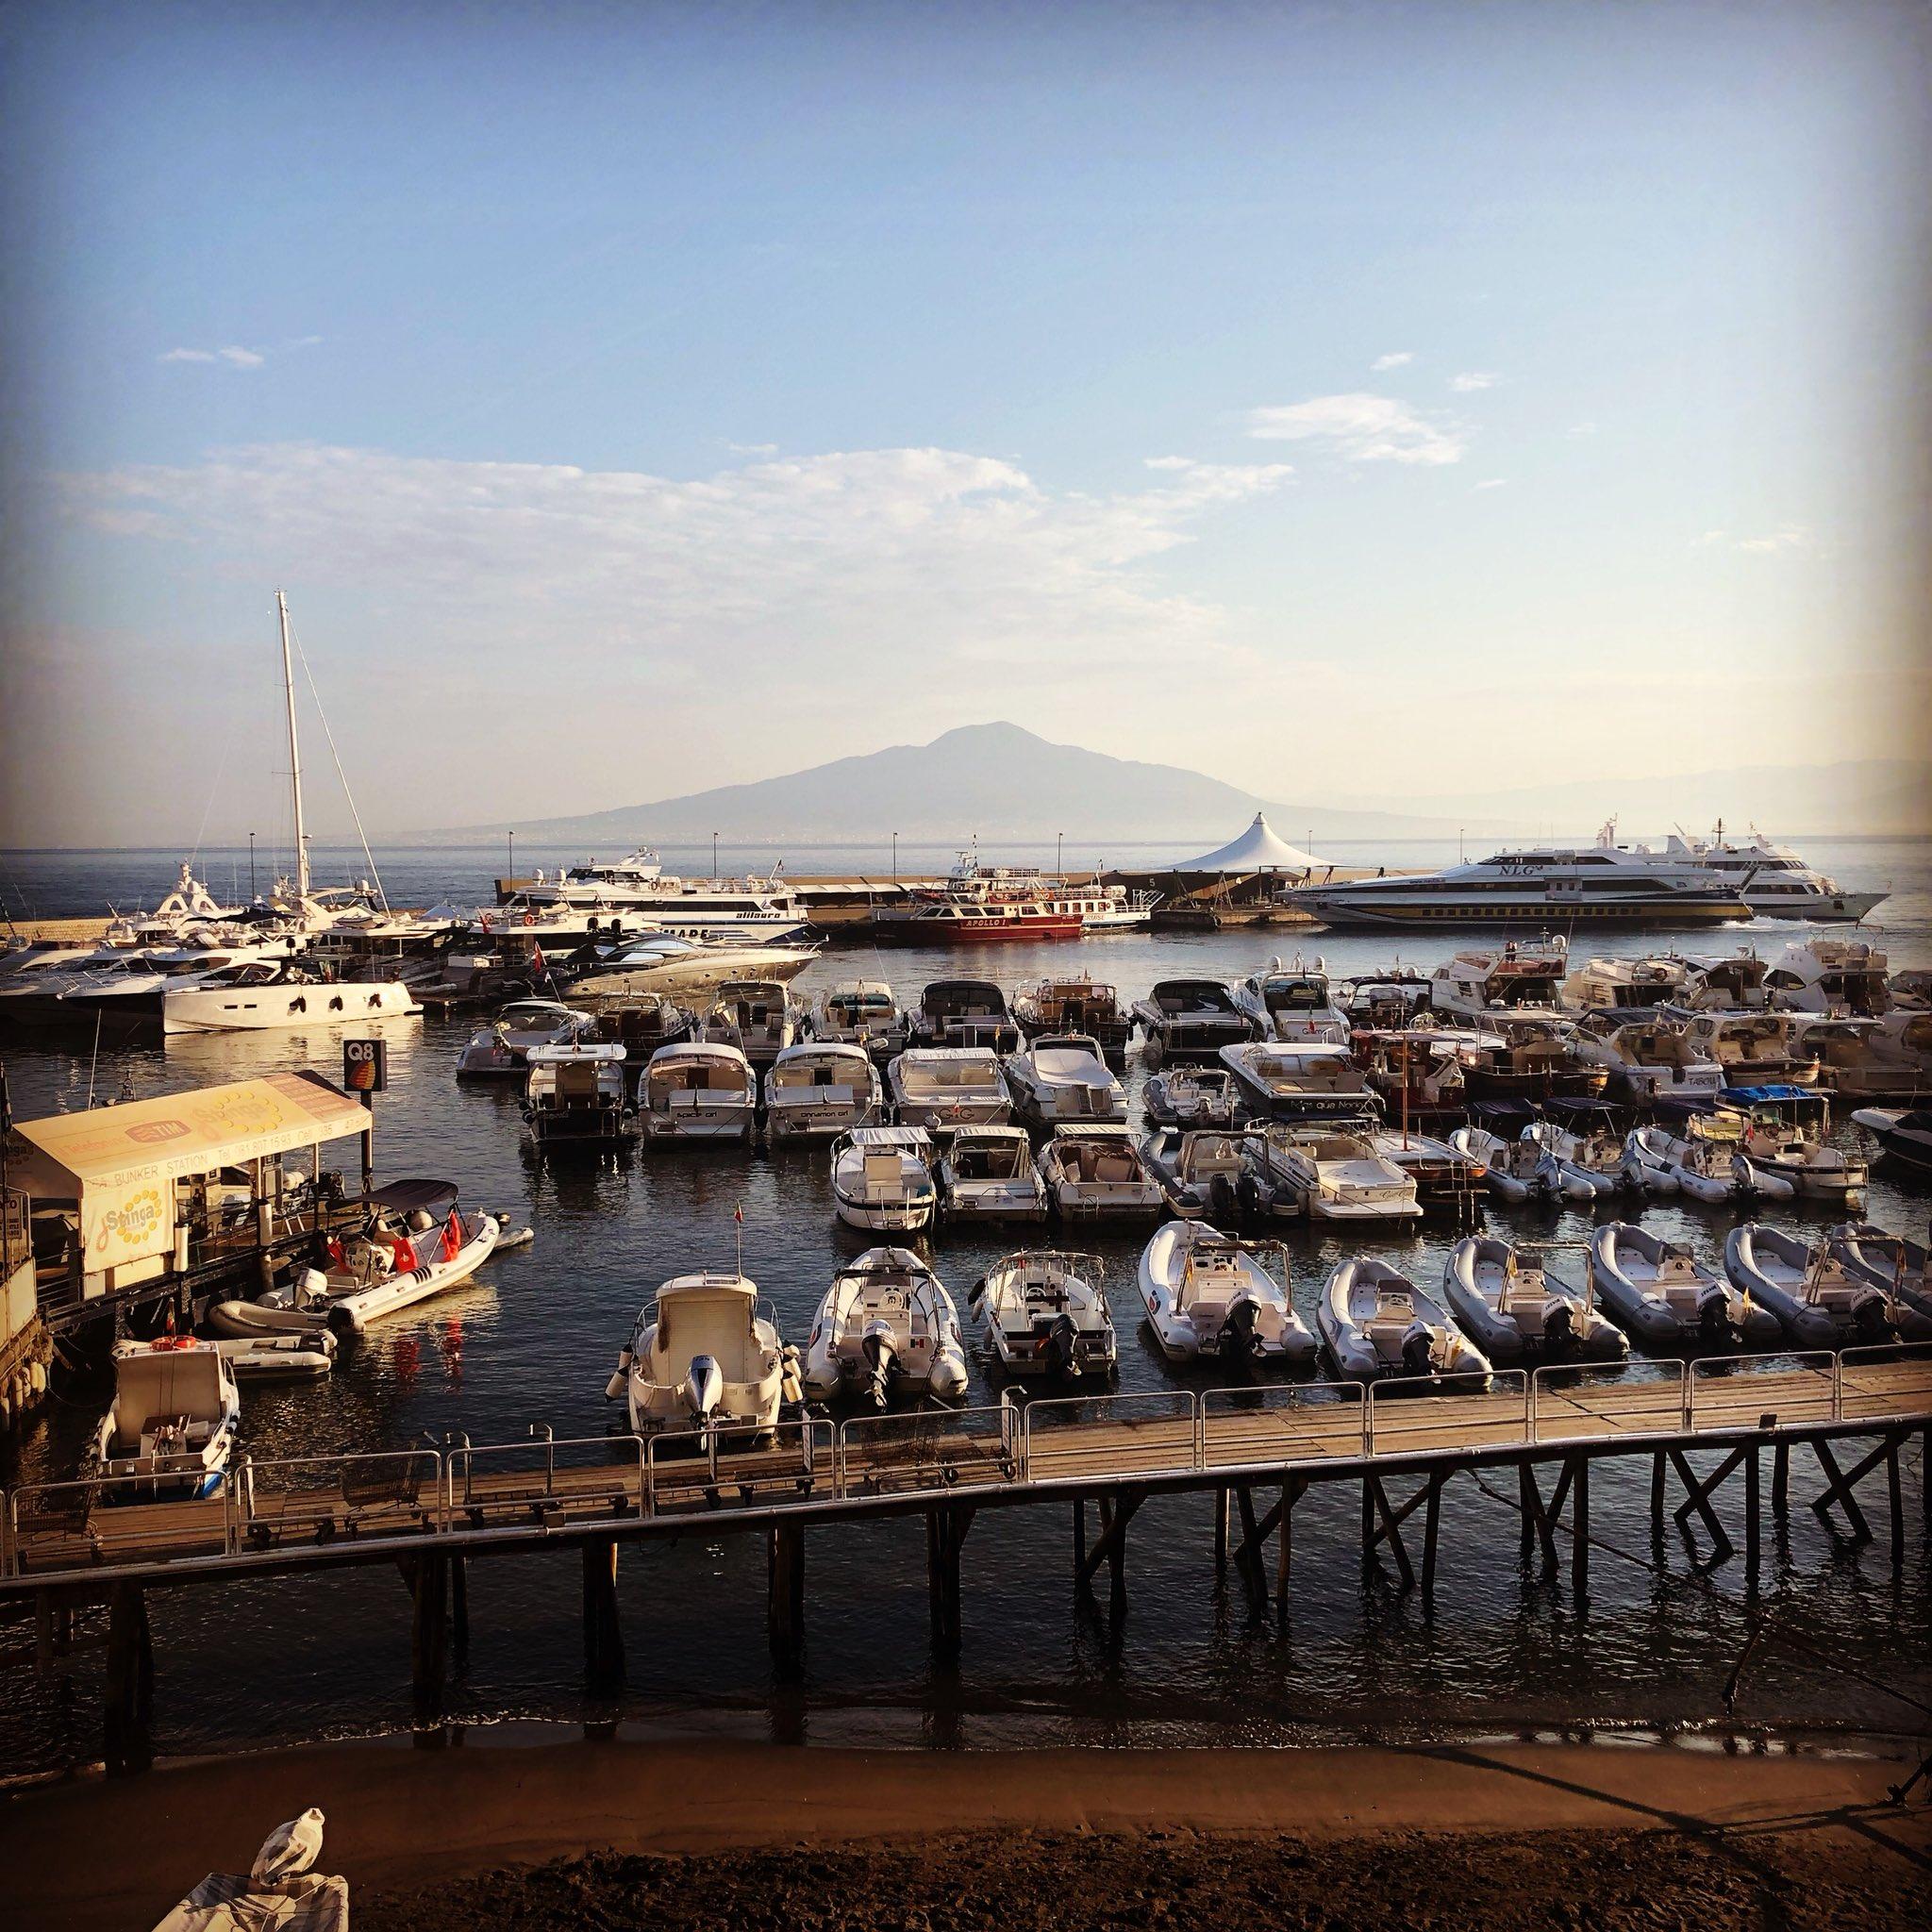 @TravelGov #PhotoChallenge #Travelgram Sorrento, Italy on a quiet morning with Mount Vesuvius in the horizon https://t.co/lQqZ8wRwN2